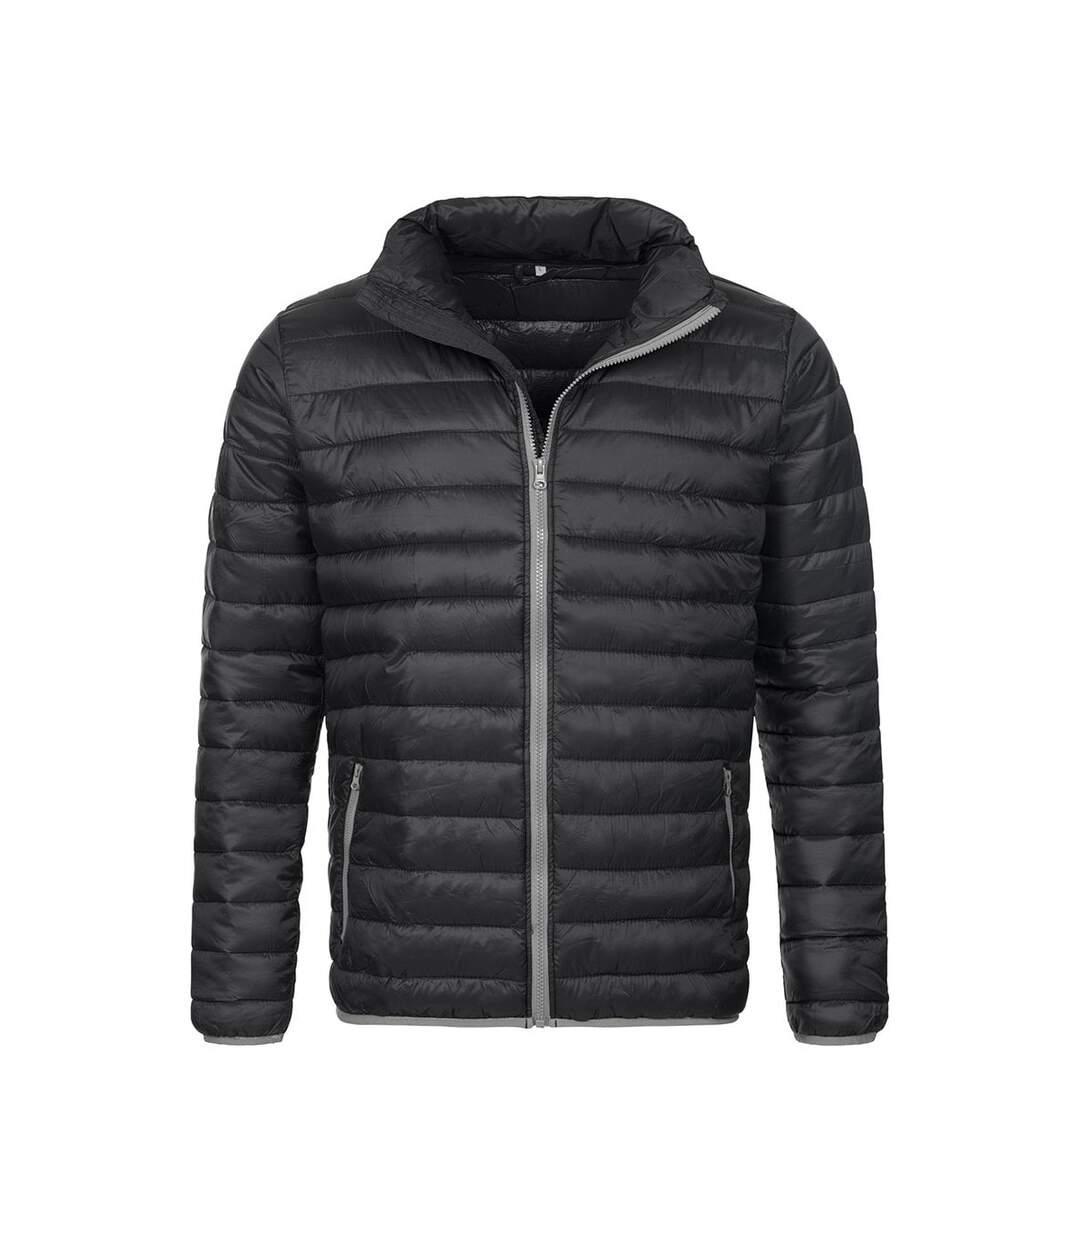 Stedman Mens Active Padded Jacket (Black Opal) - UTAB304